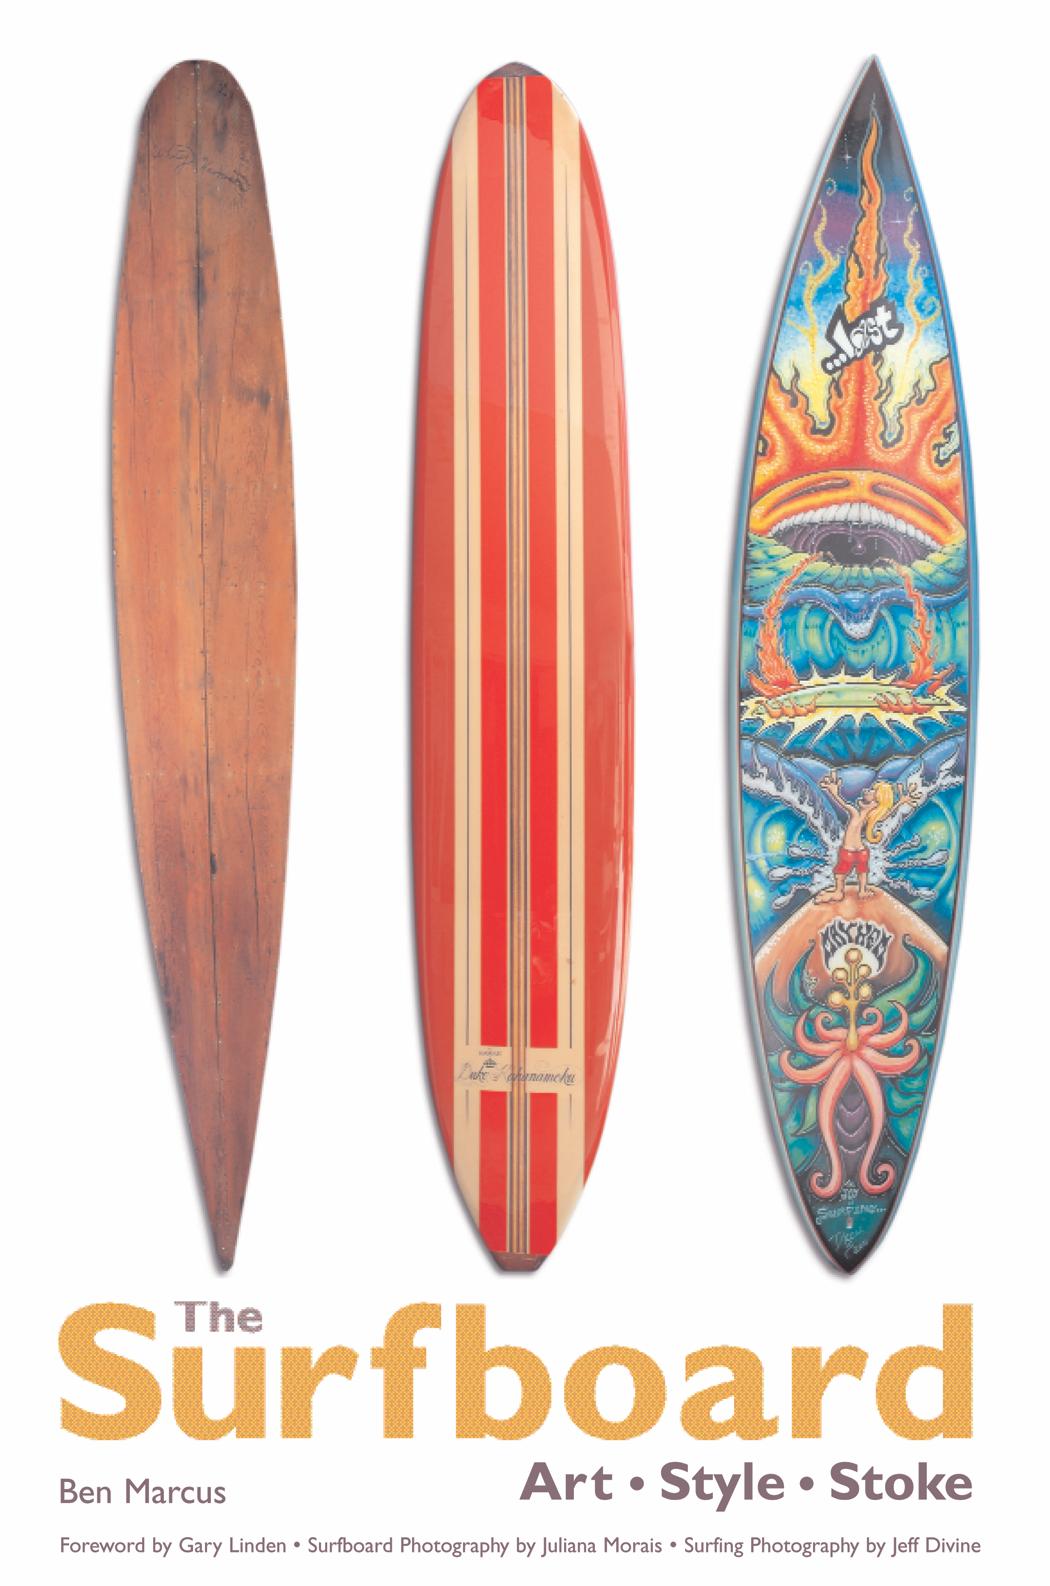 The Surfboard: Art, Style, Stoke (2007)